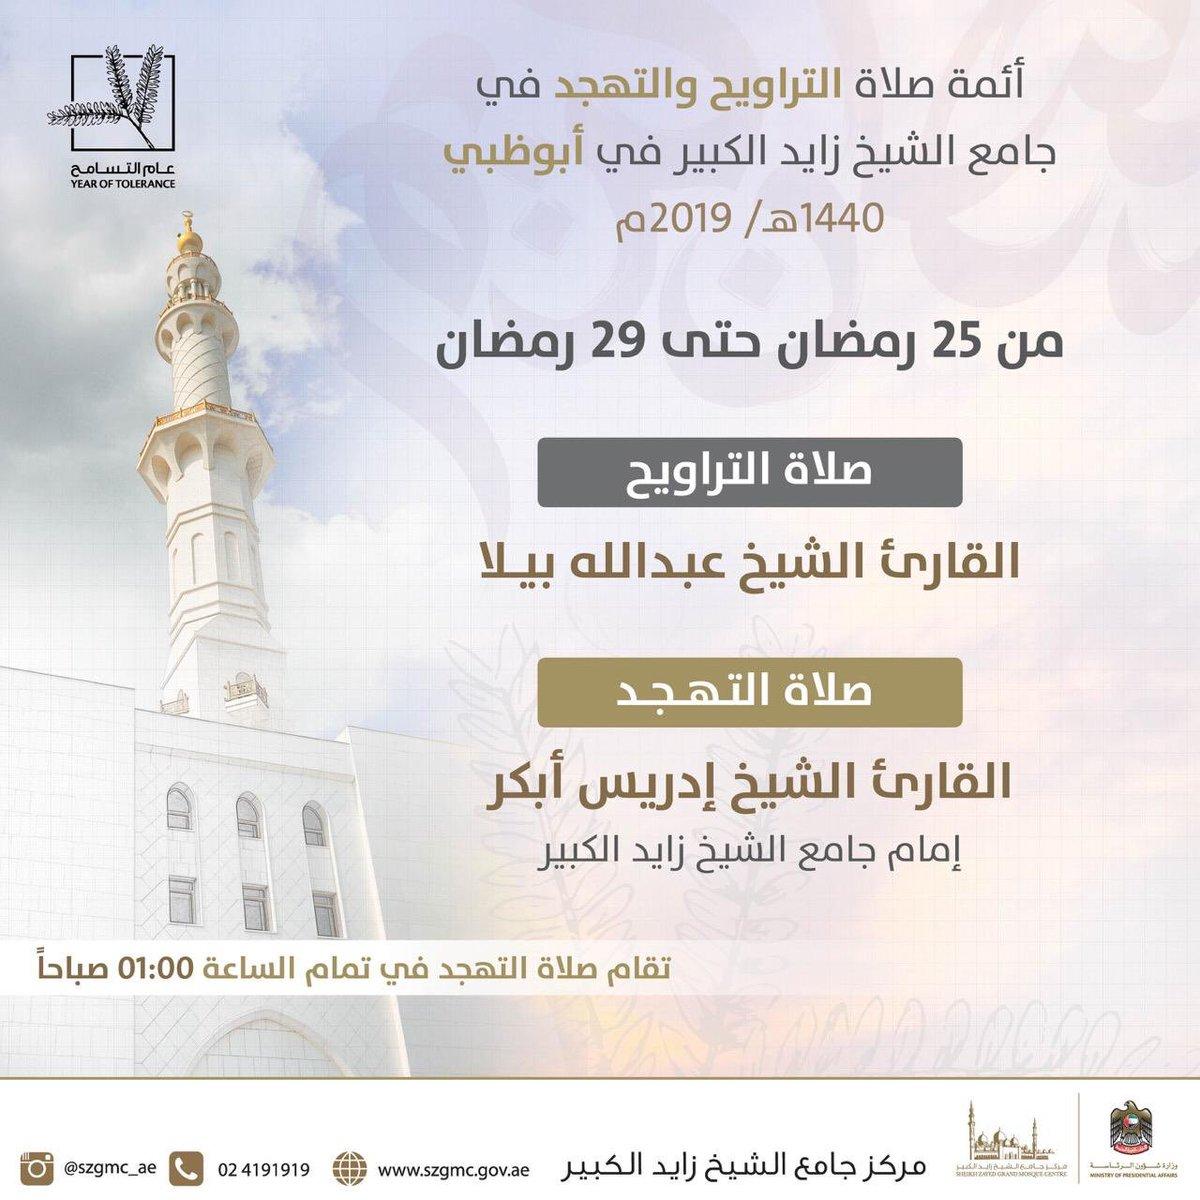 2ee3d61adaf73 وتقام صلاة التهجد في تمام الساعة الواحدة صباحاً.  برق الإمارات  szgmc aepic. twitter.com ftZzCkC0tH